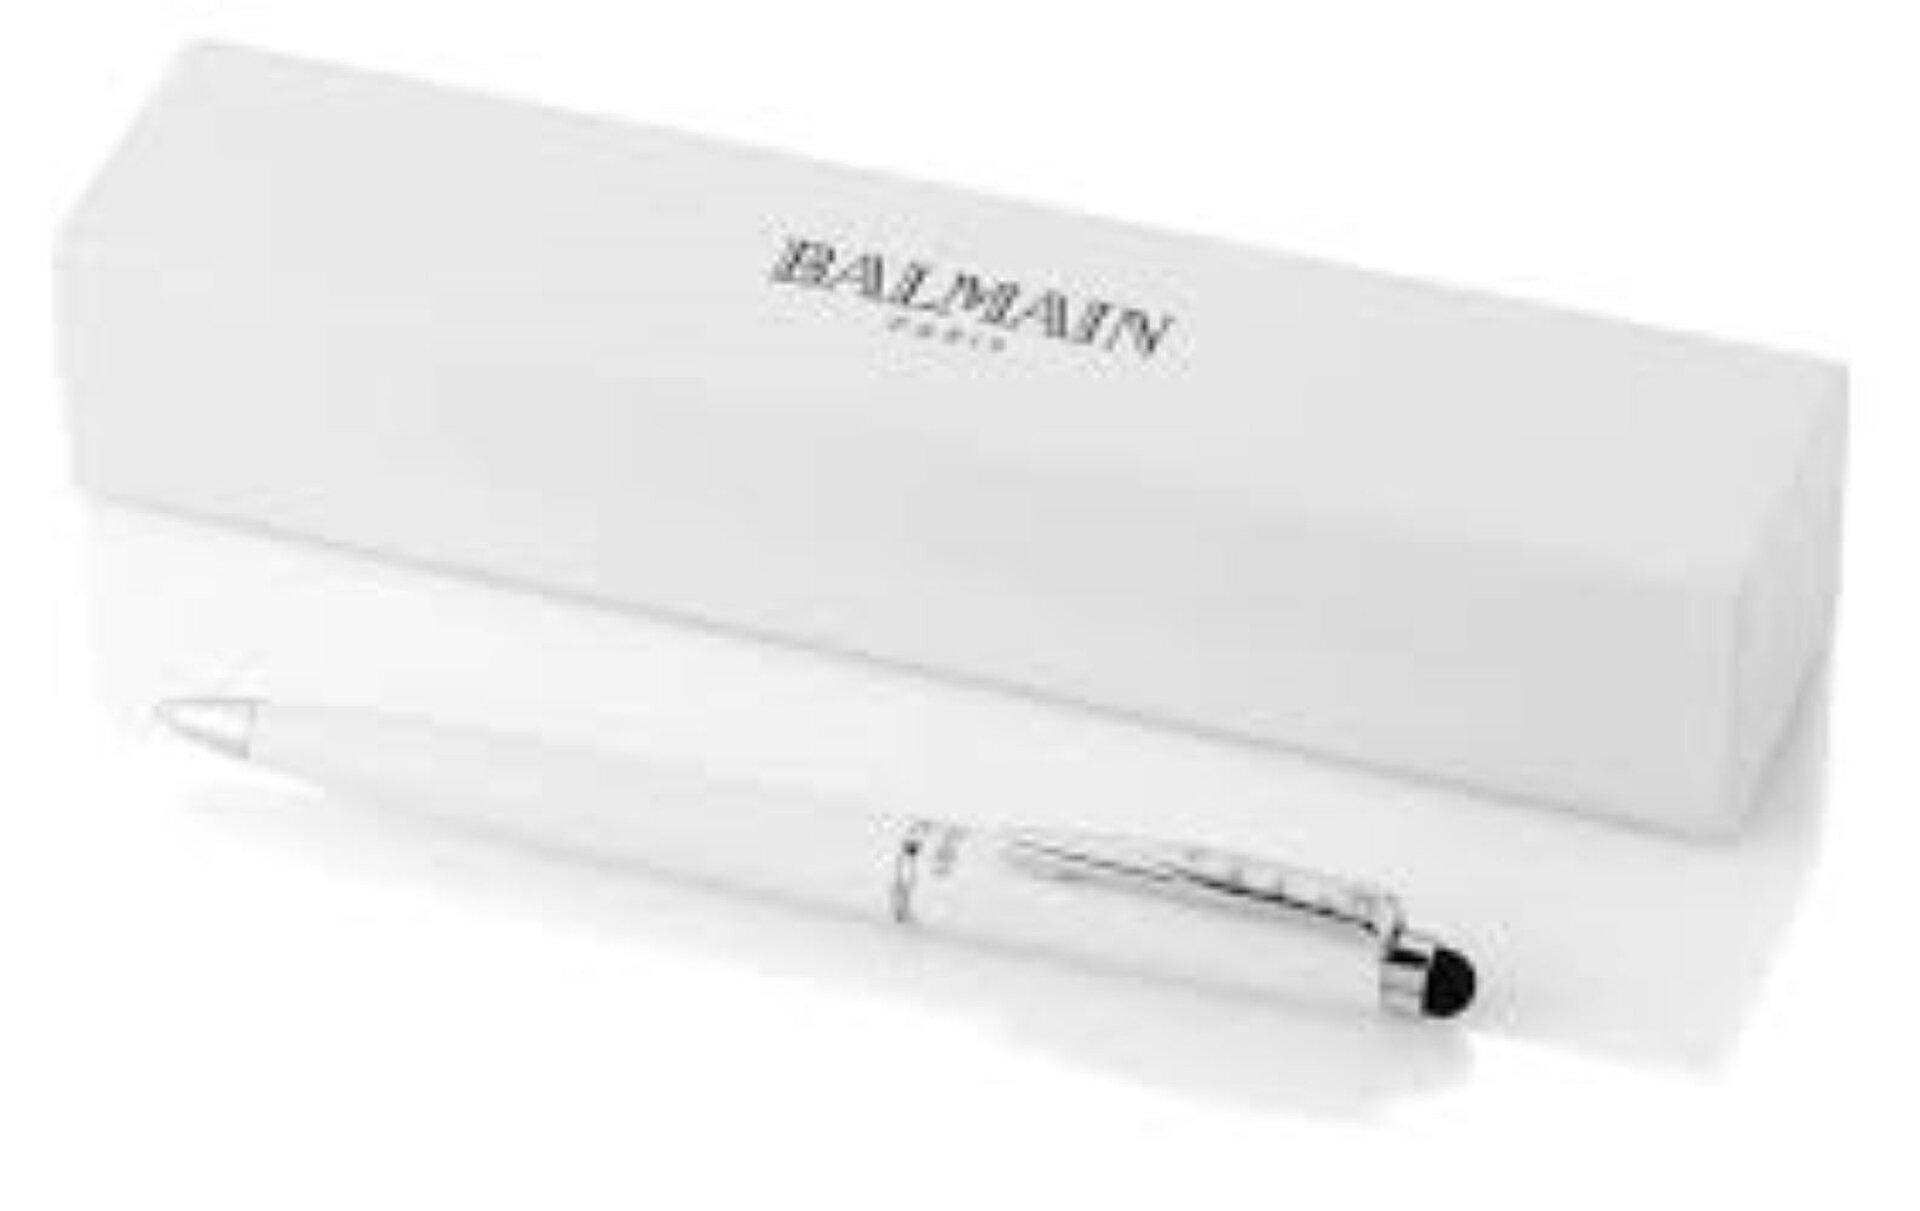 Picture of Balmain 10640800 Maud Stylus Beyaz Tükenmez Kalem